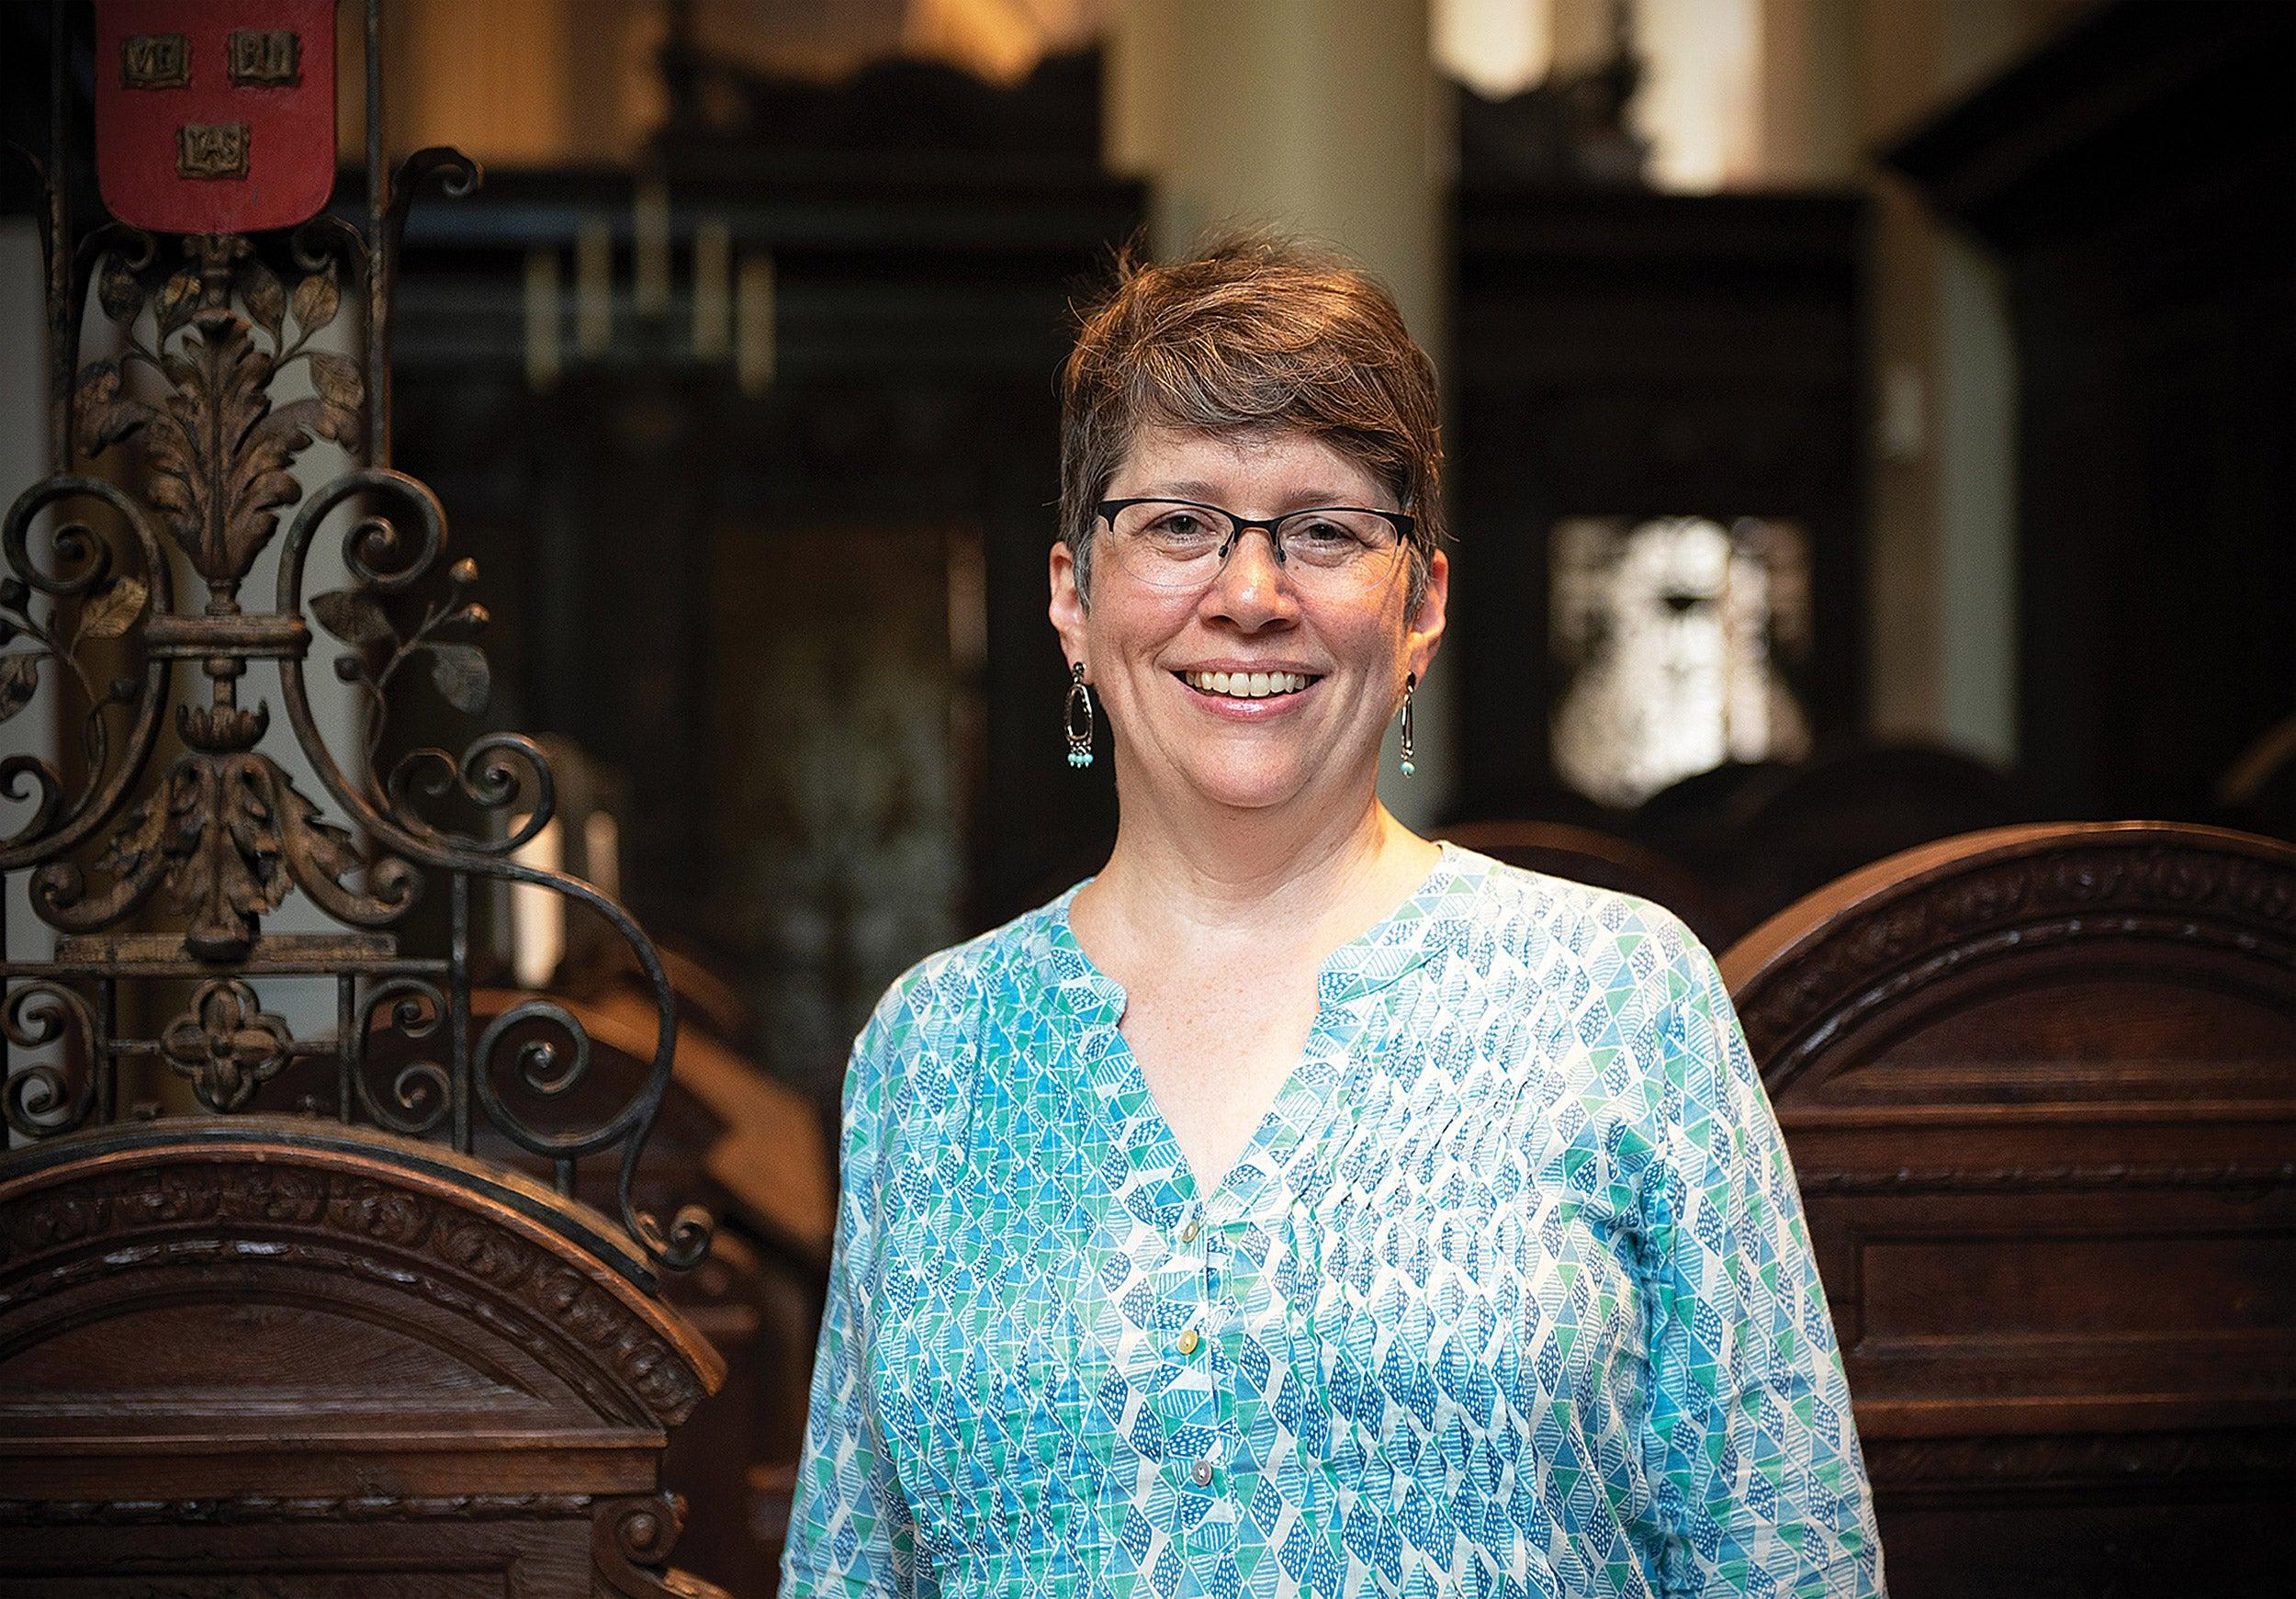 Stephanie Paulsell named interim minister at Harvard's Memorial Church